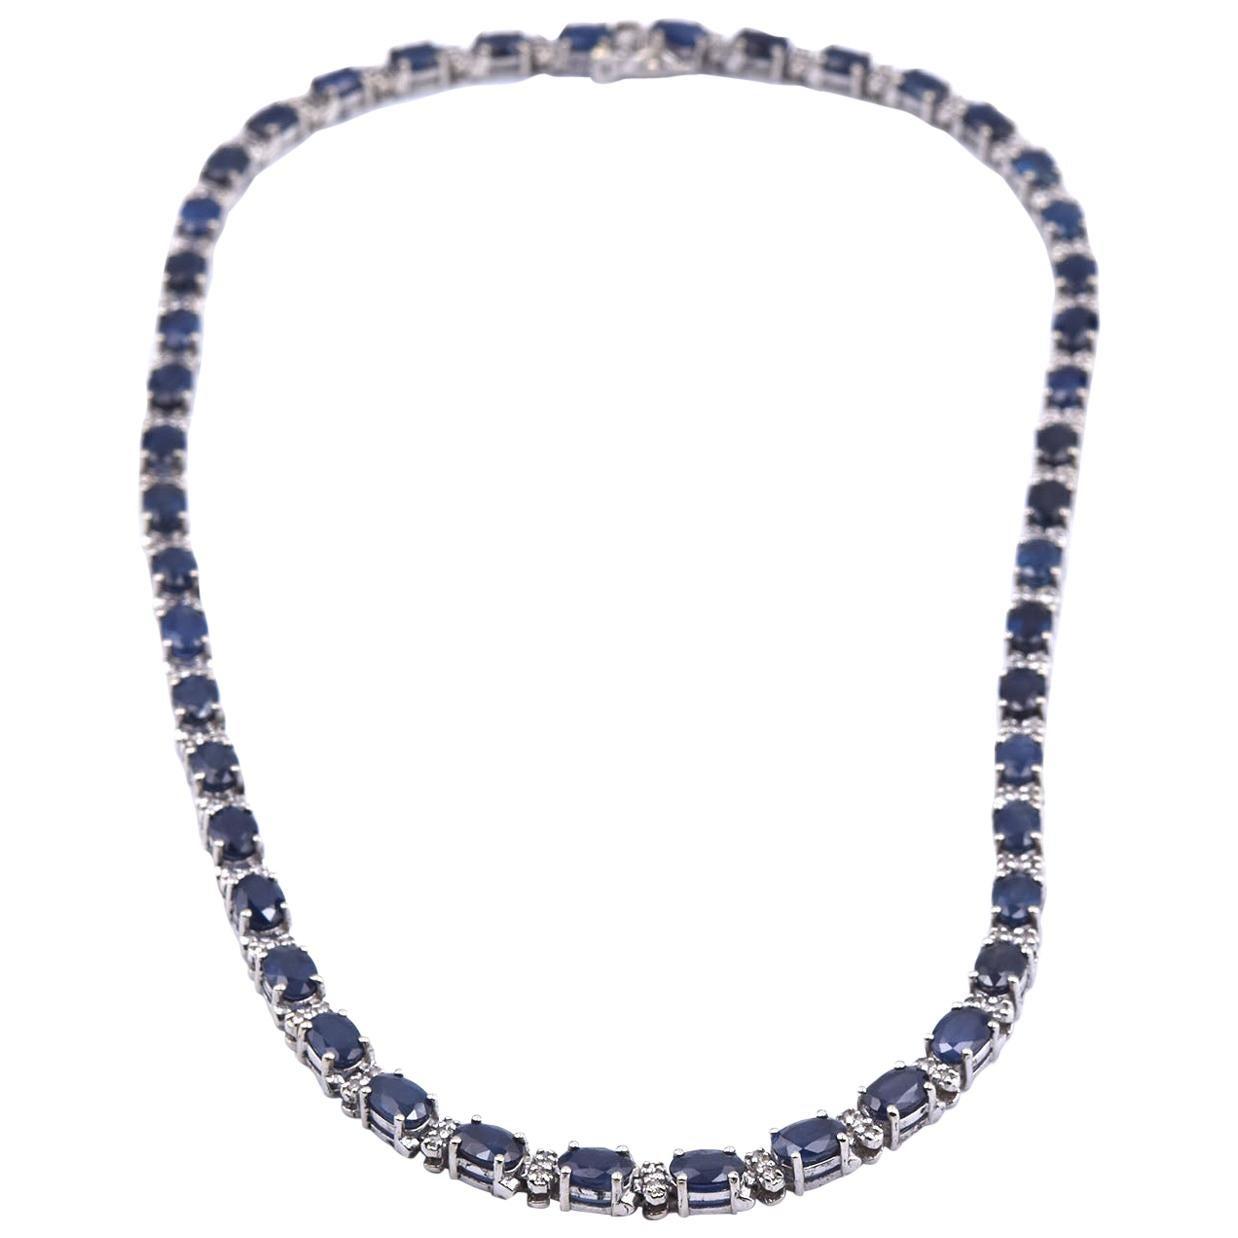 14 Karat White Gold Sapphire and Diamond Inline Tennis Necklace